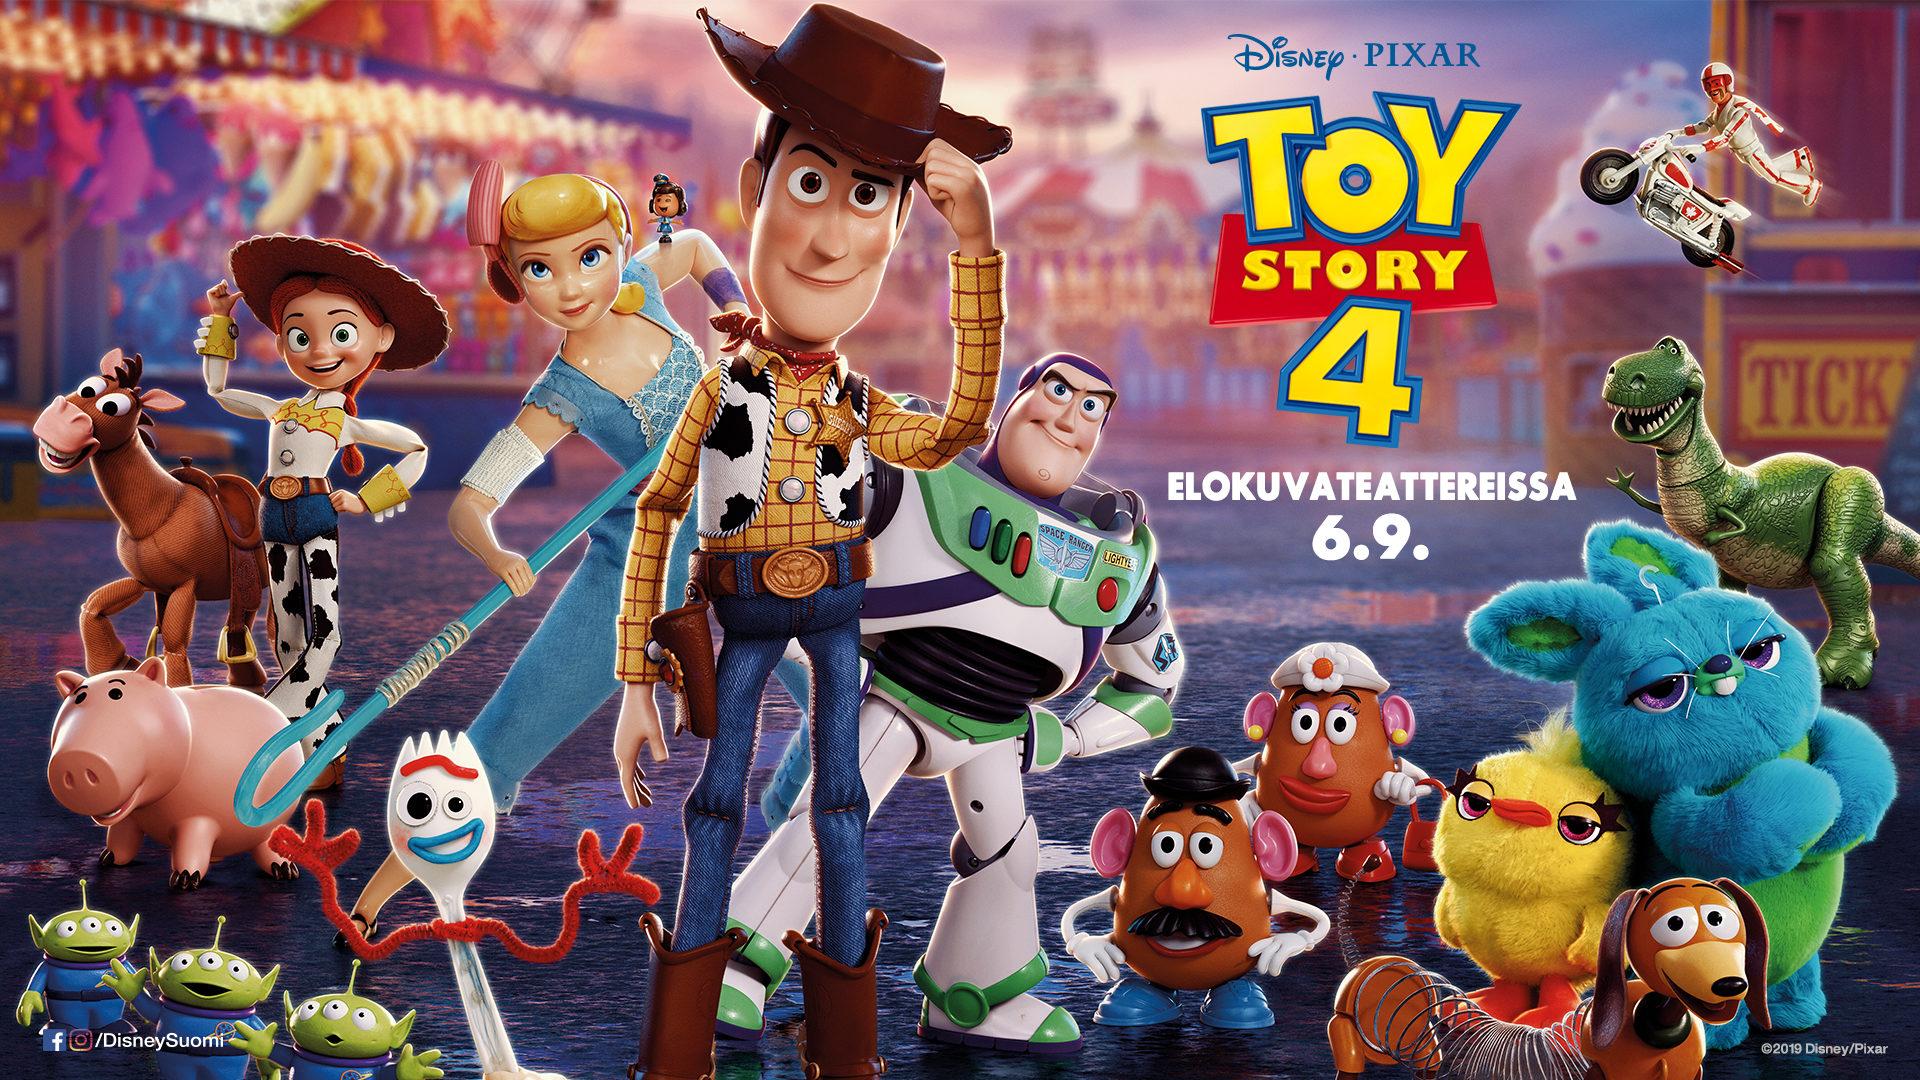 Toy Story 4 DUB 2D